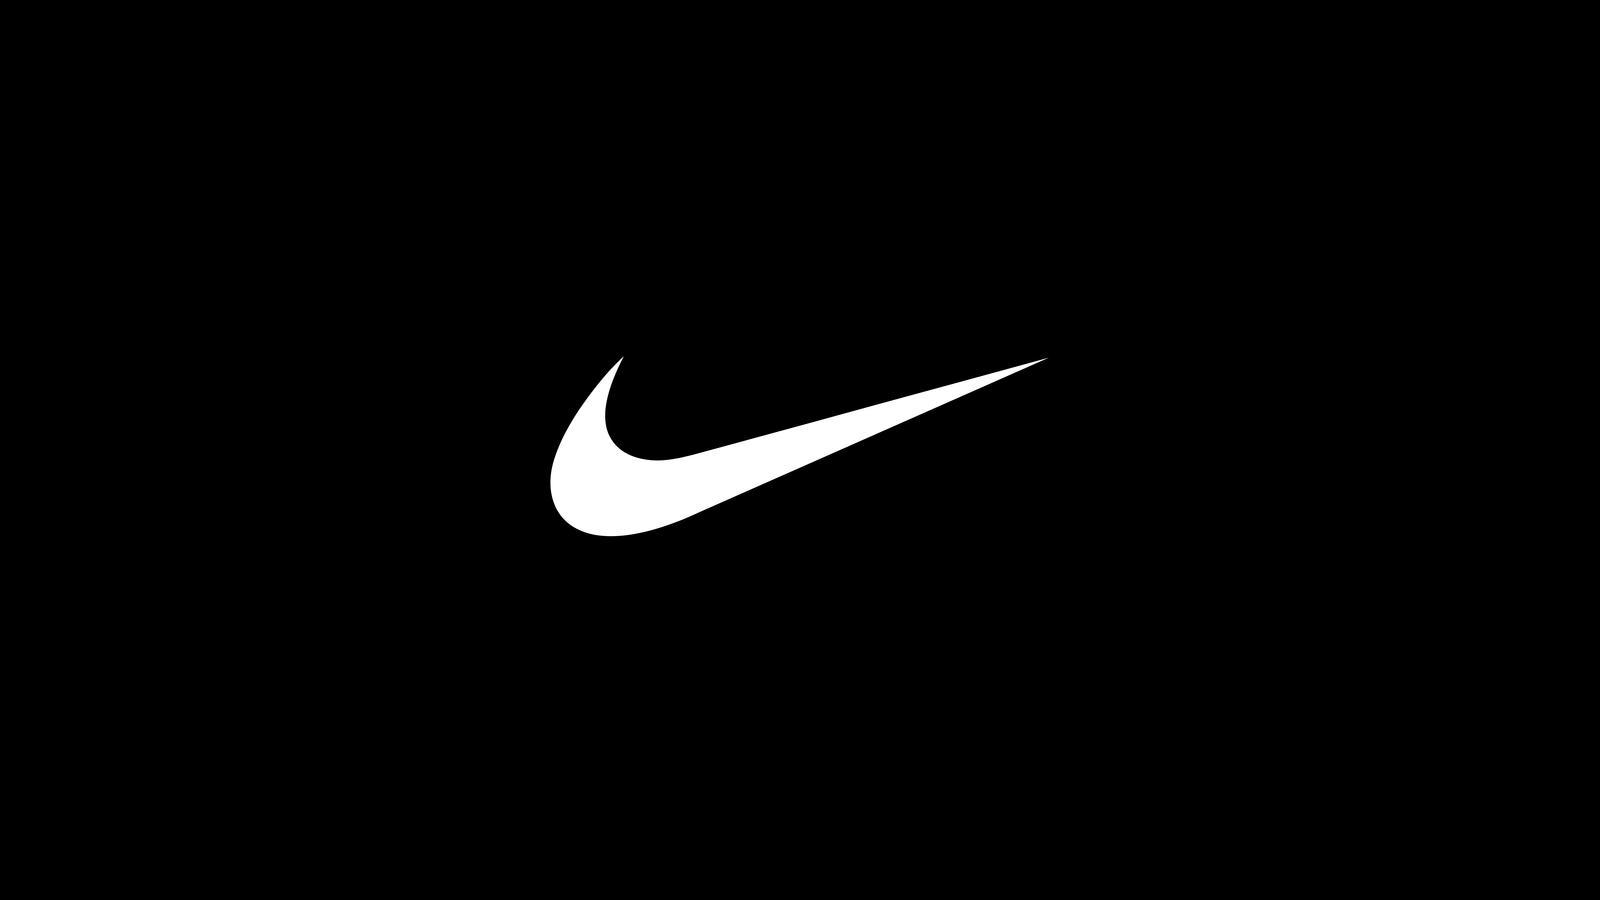 Nike swoosh logo white small hd 1600